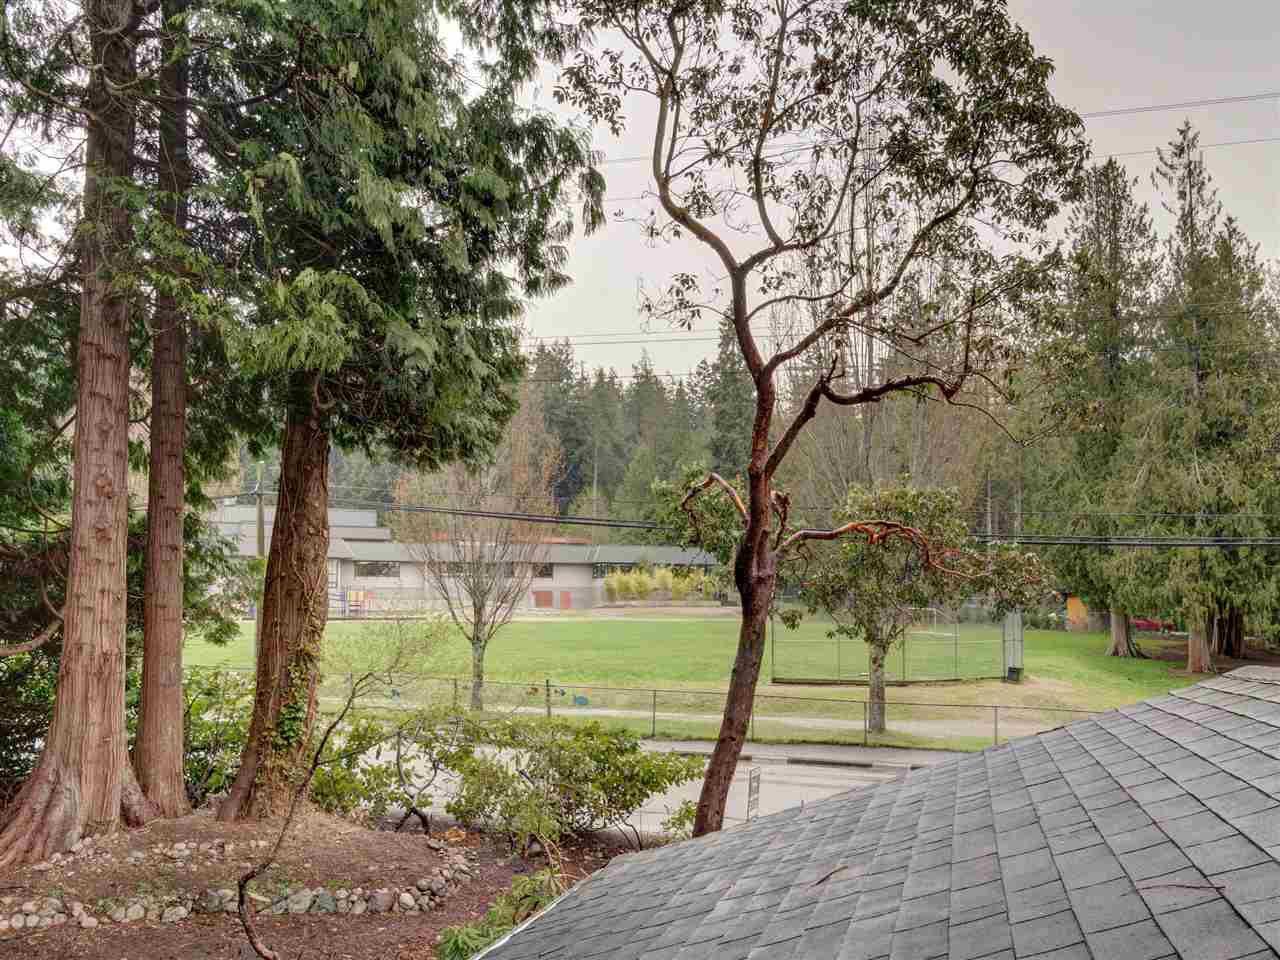 Photo 19: Photos: 1085 ROBERTS CREEK Road: Roberts Creek House for sale (Sunshine Coast)  : MLS®# R2392415